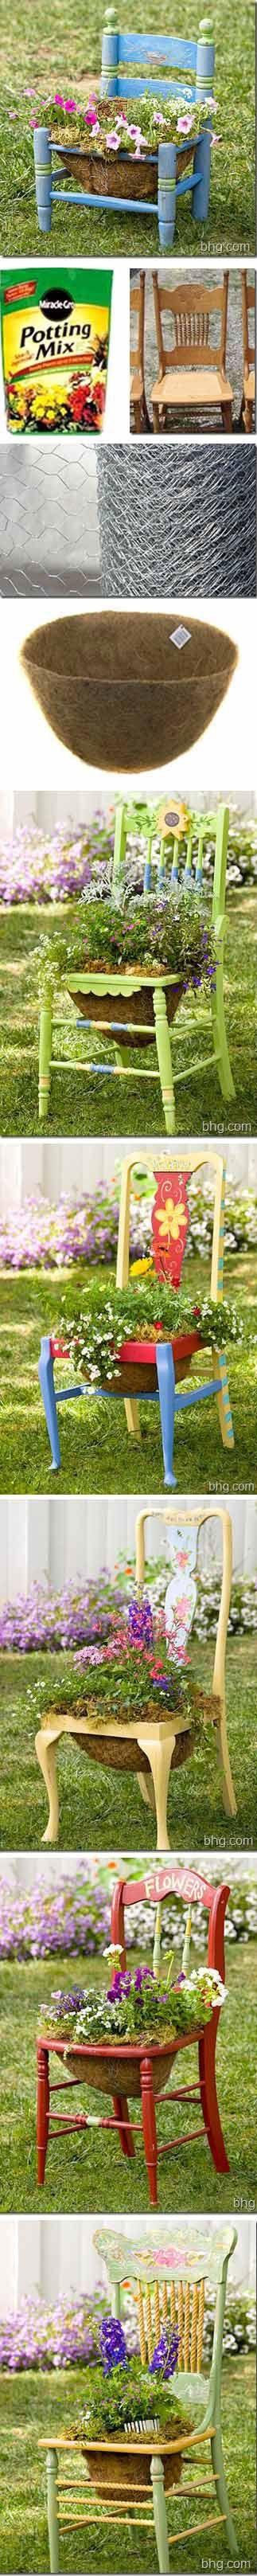 Gardening-Forniture Craft Chairs